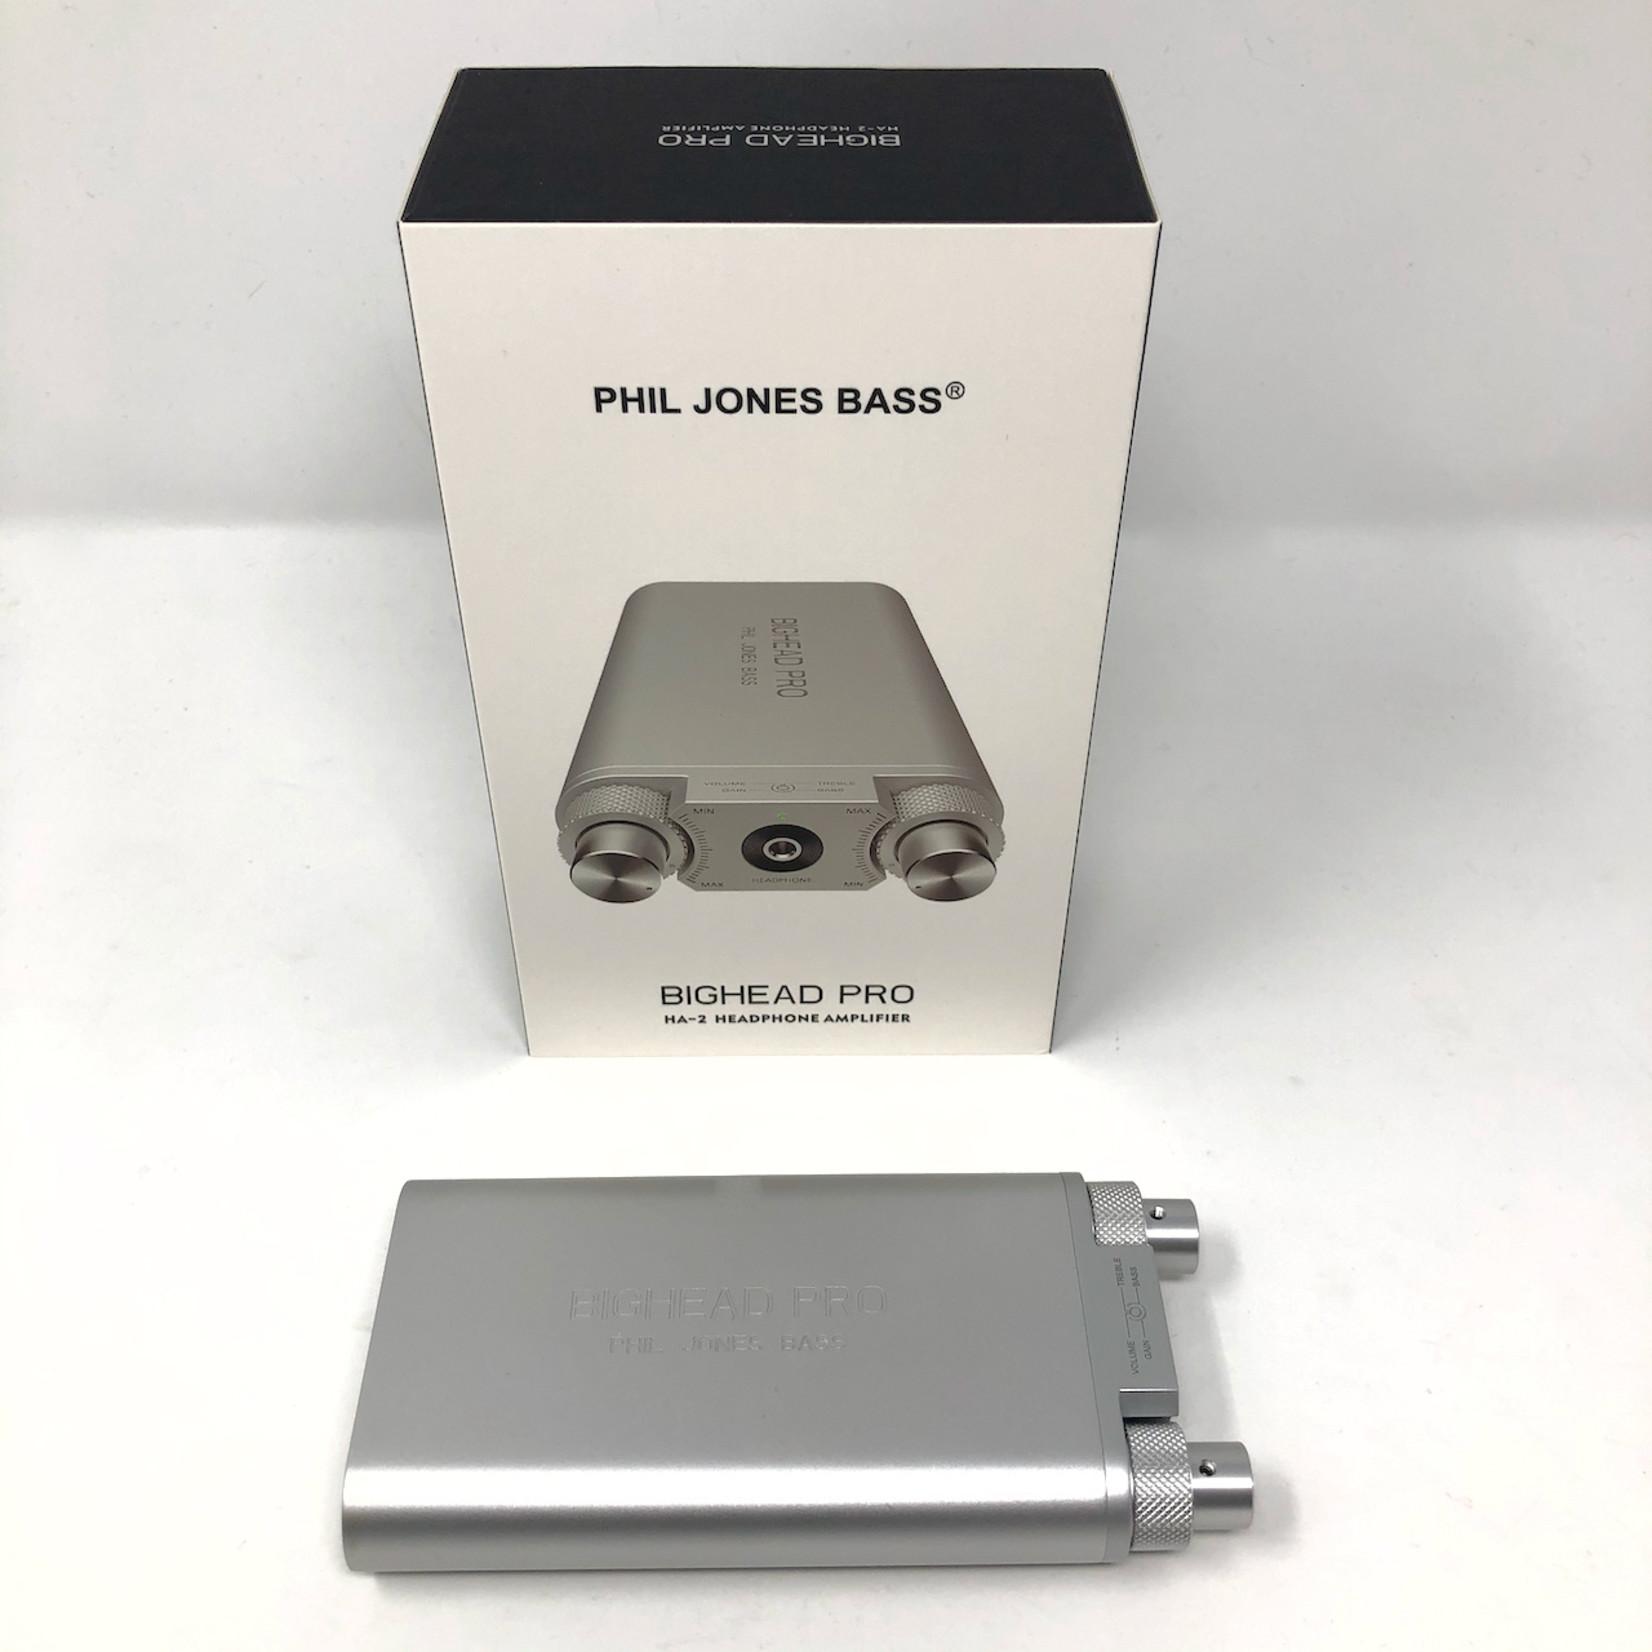 Phil Jones Phil Jones Bass BigHead Pro Multi-Function Headphone Amplifier & Digital Audio Interface (HA-2)